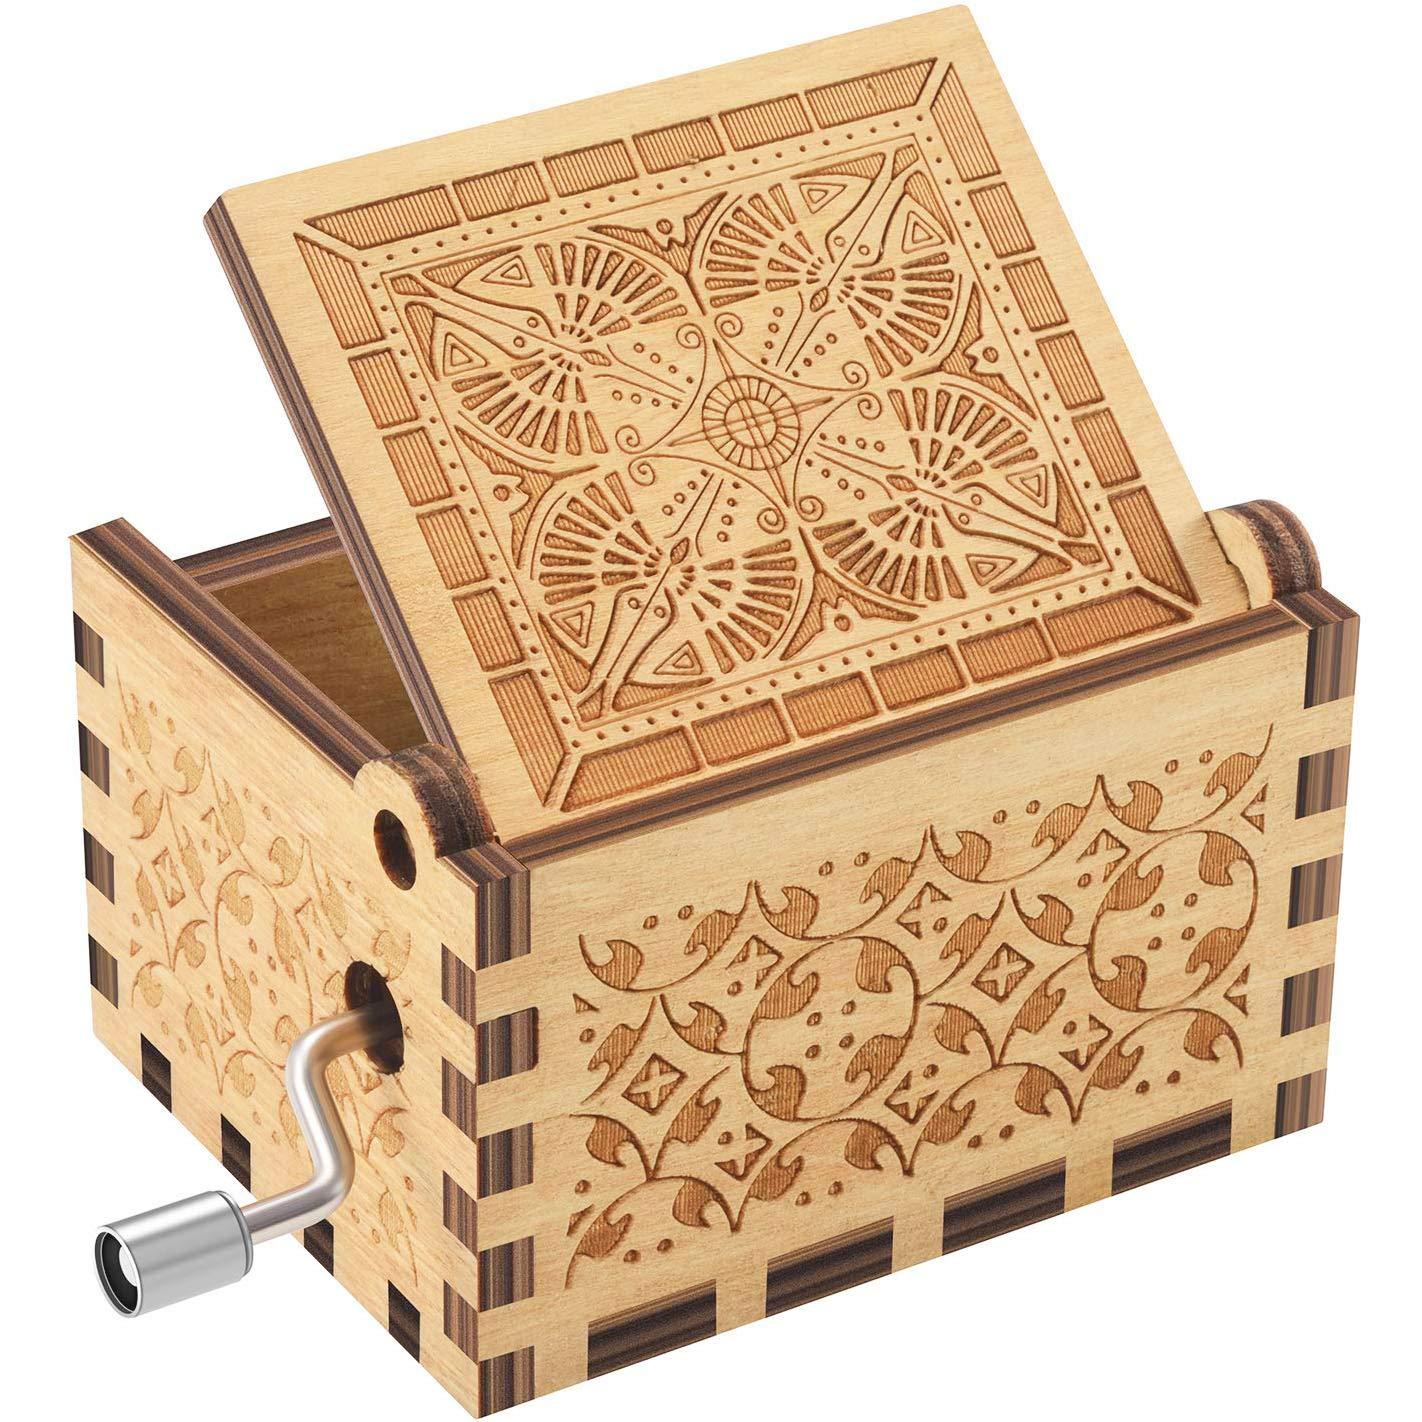 ukebobo Wooden Music Box 1 Set You are My Sunshine Music Box,Birthday Gifts